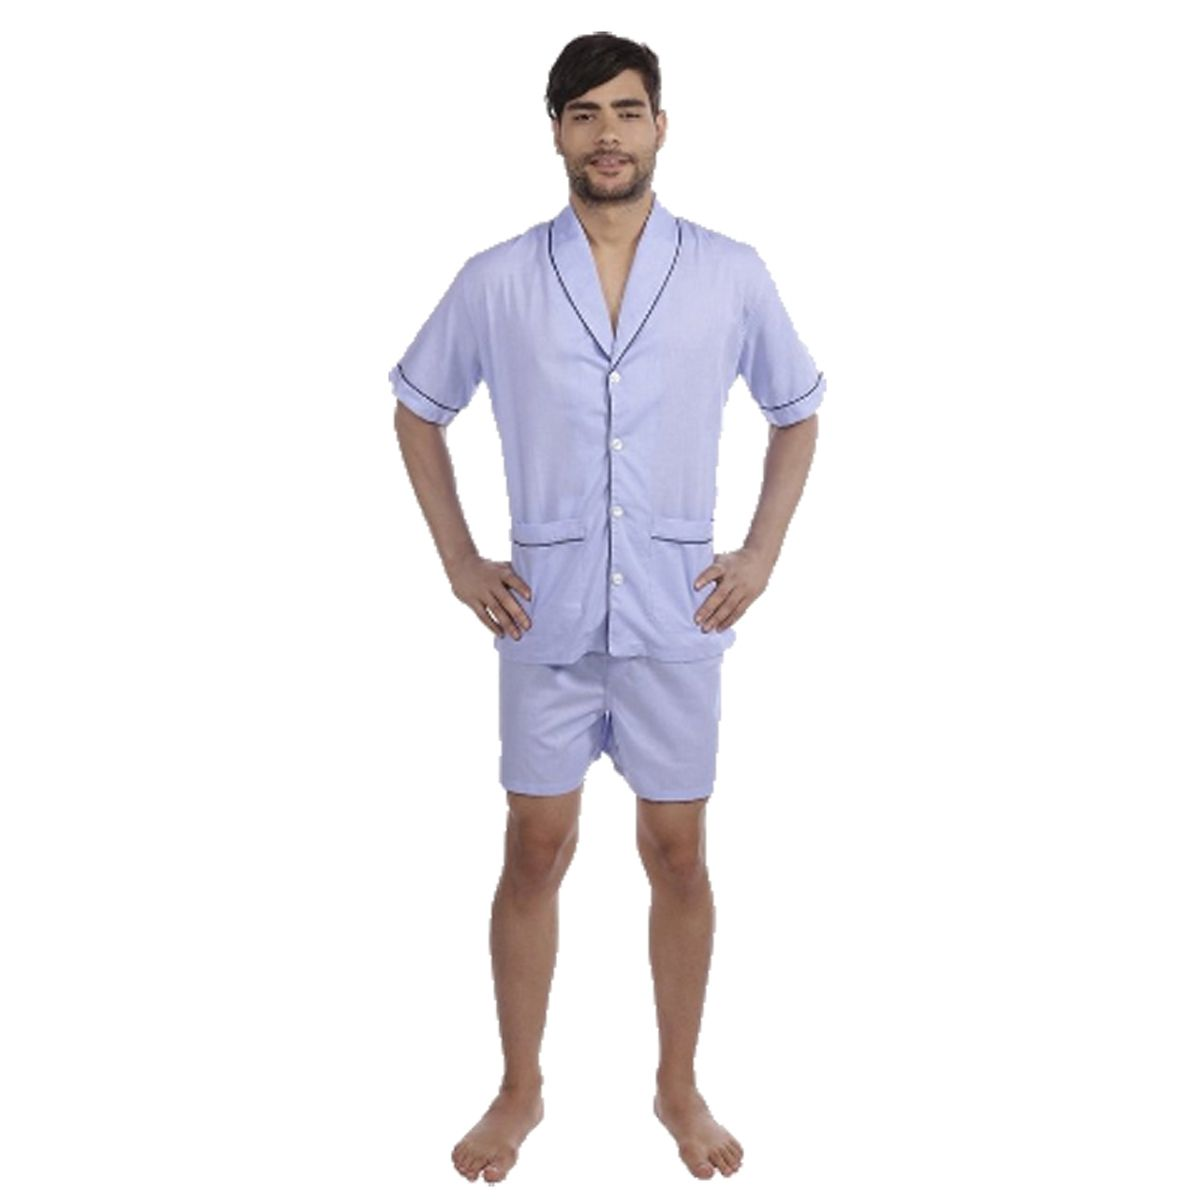 Pijama Masculino Curto Aberto Puro Algodão Presidente - PC83